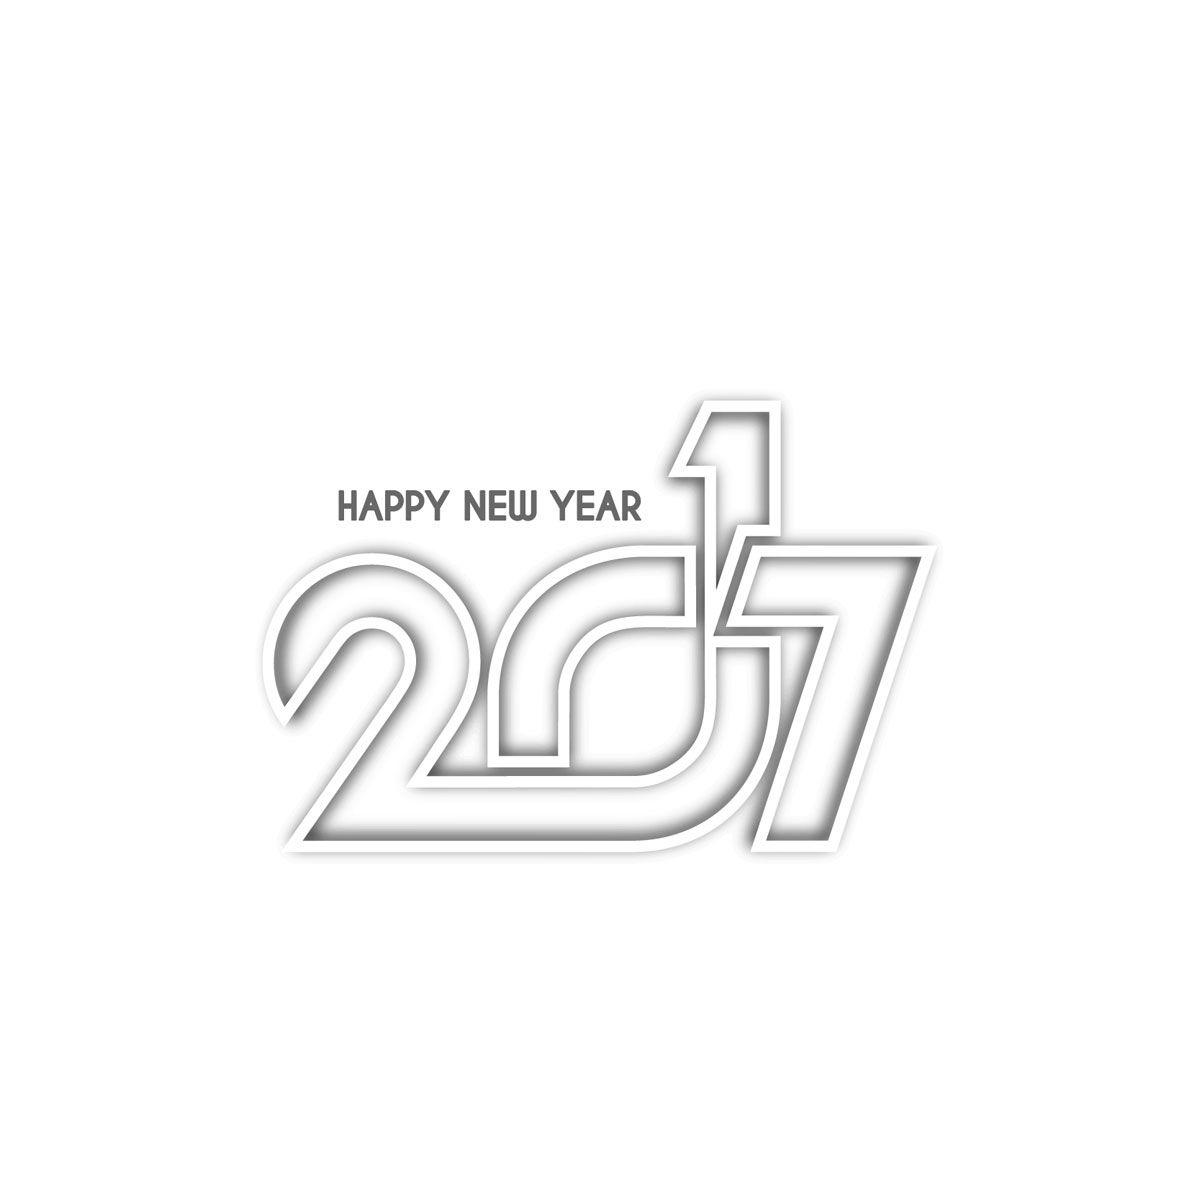 Top 1000 Happy New Year 2017 Whatsapp Facebook Status In Hindi